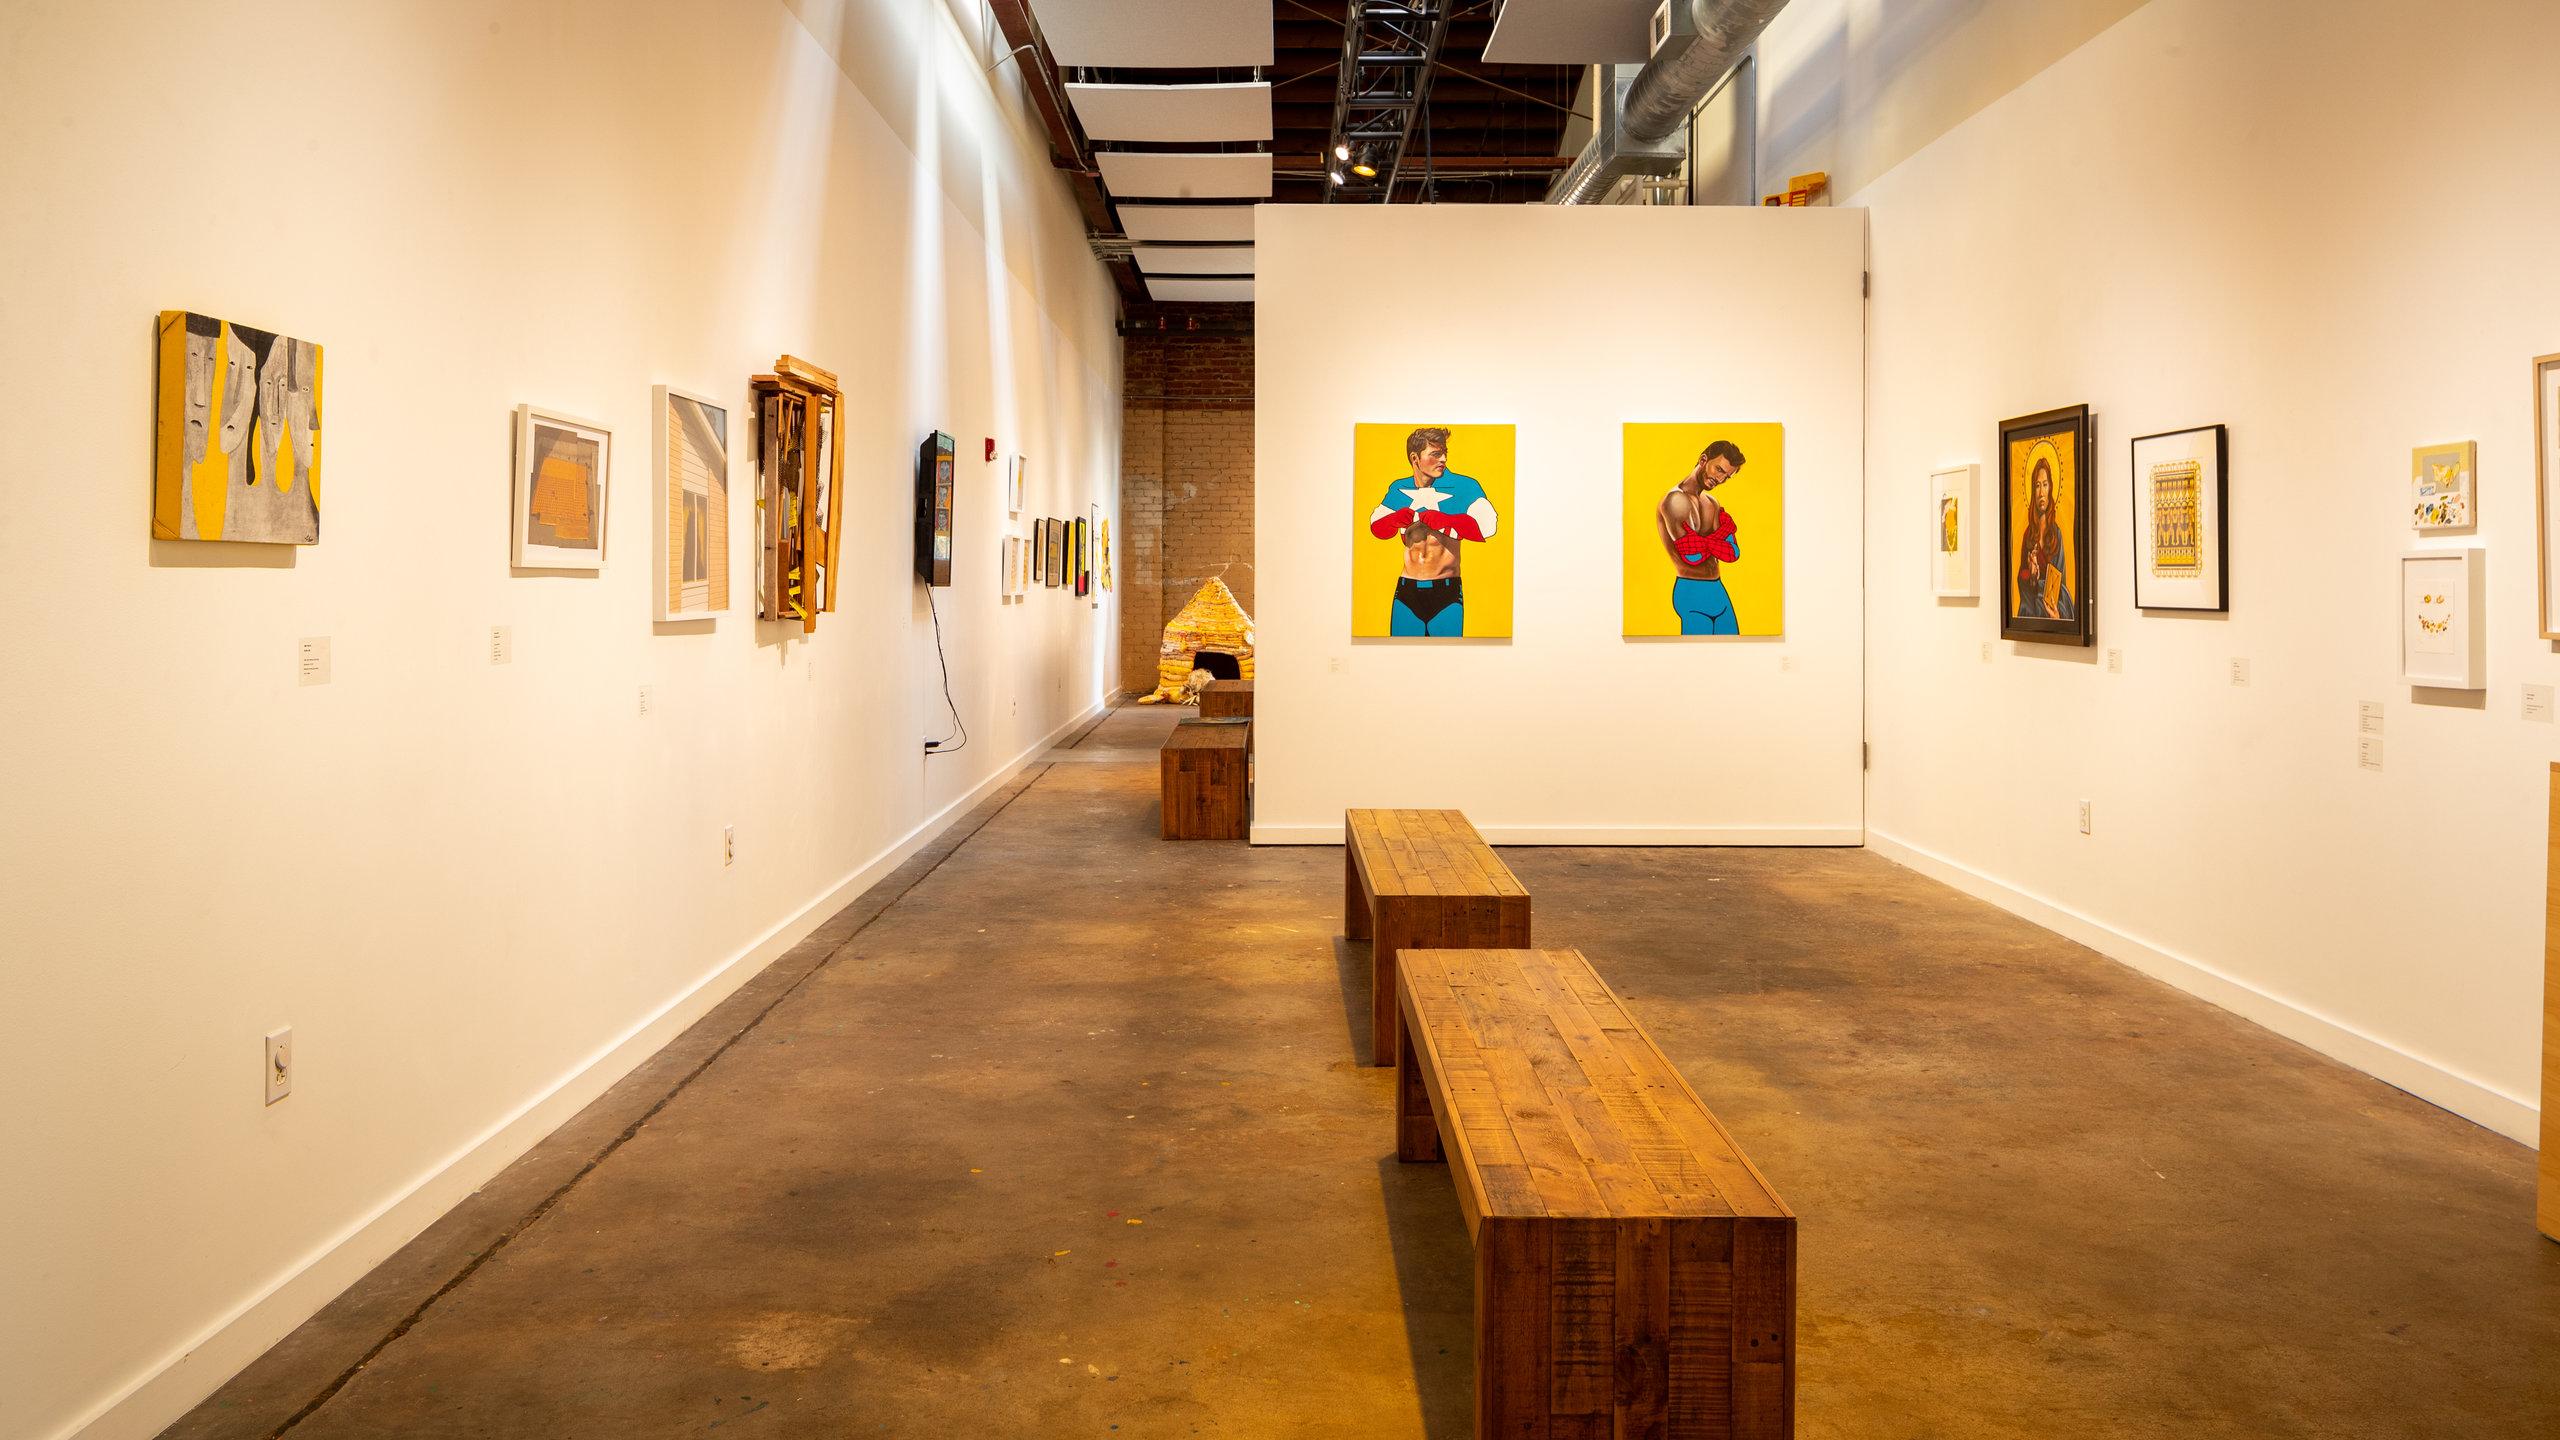 Athens Institute for Contemporary Art, Athens, Georgia, United States of America